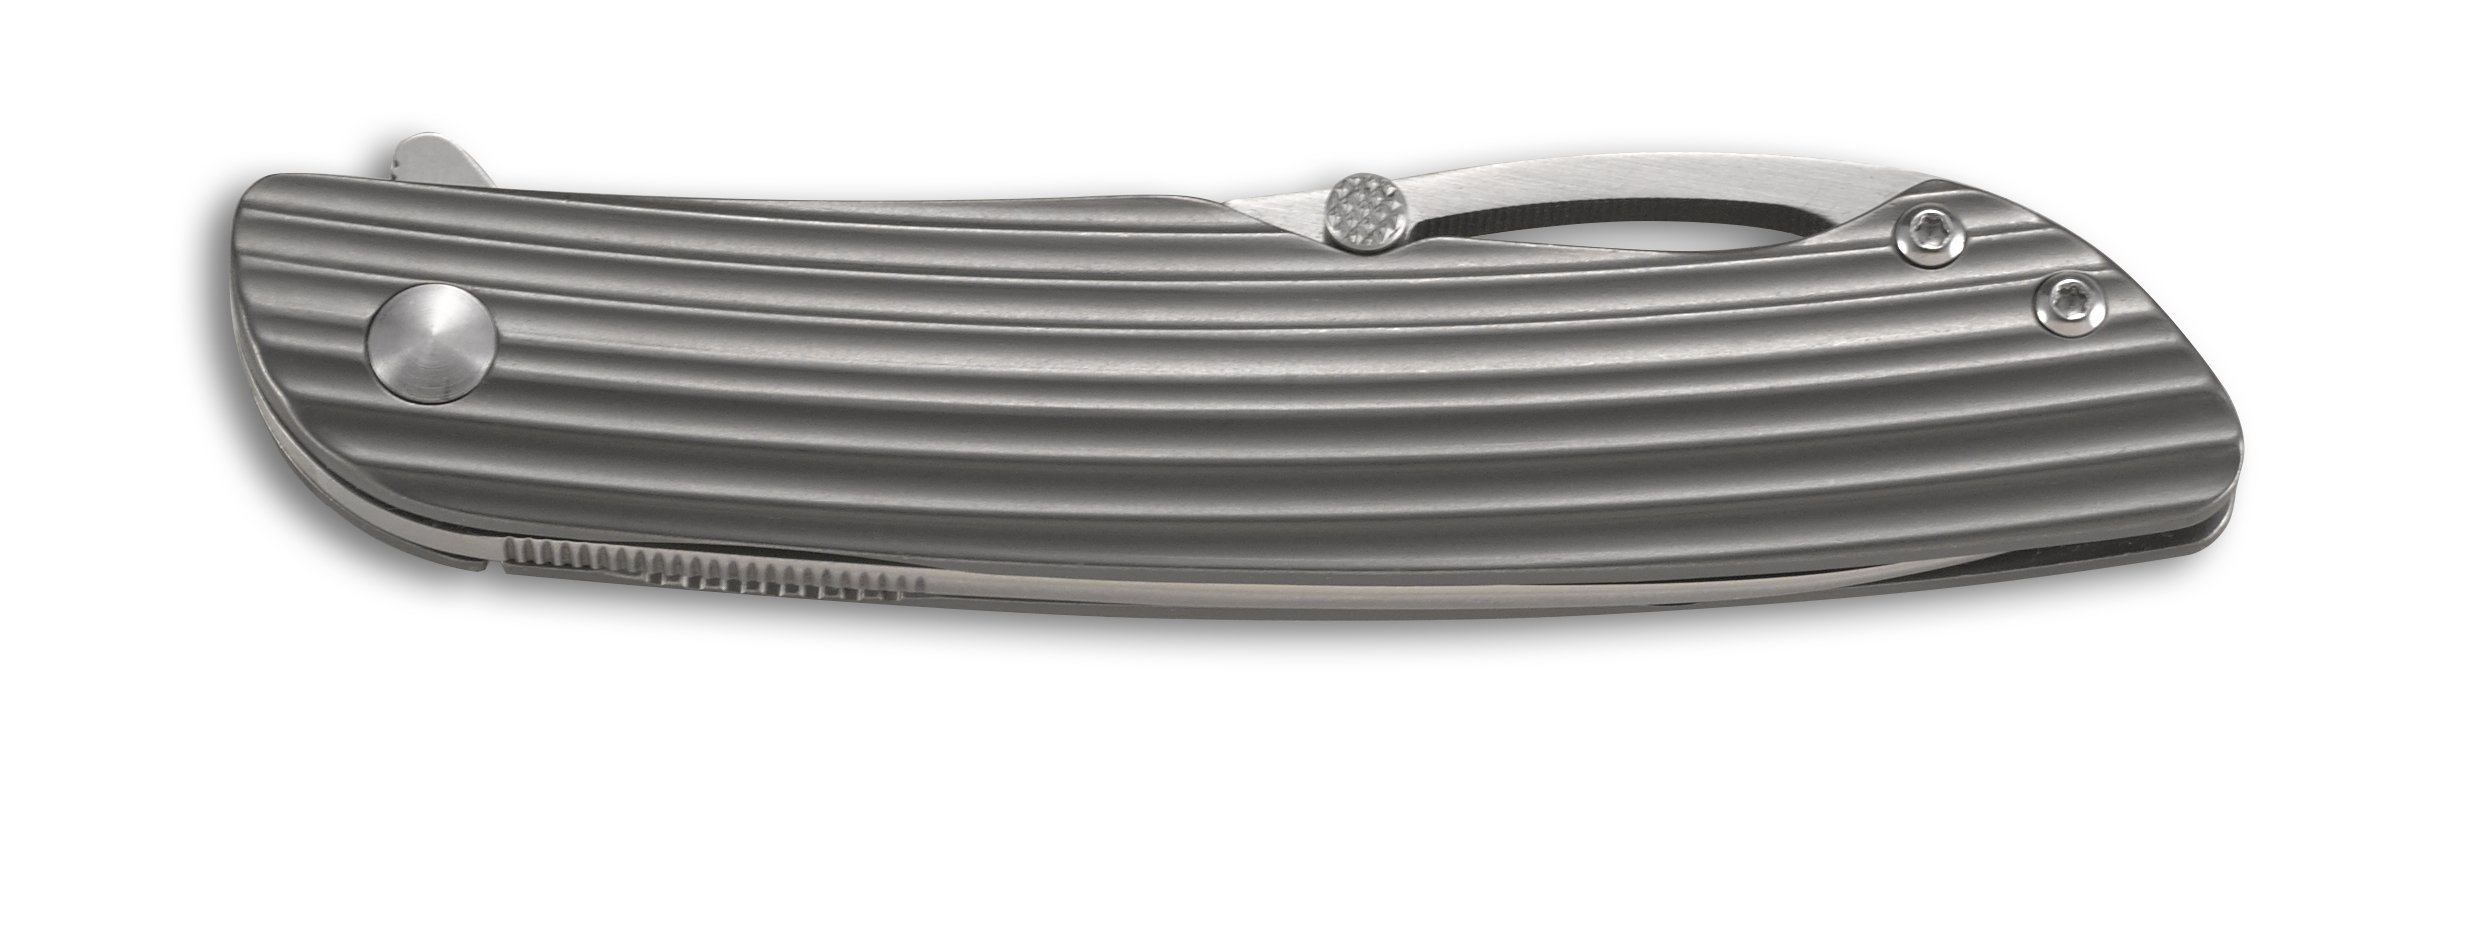 CRKT Swindle EDC Folding Pocket Knife: Gentleman Everyday Carry, Satin Blade, IKBS Ball Bearing Pivot, Locking Liner, Grooved Handle, Tensioned Pocket Clip K241XXP